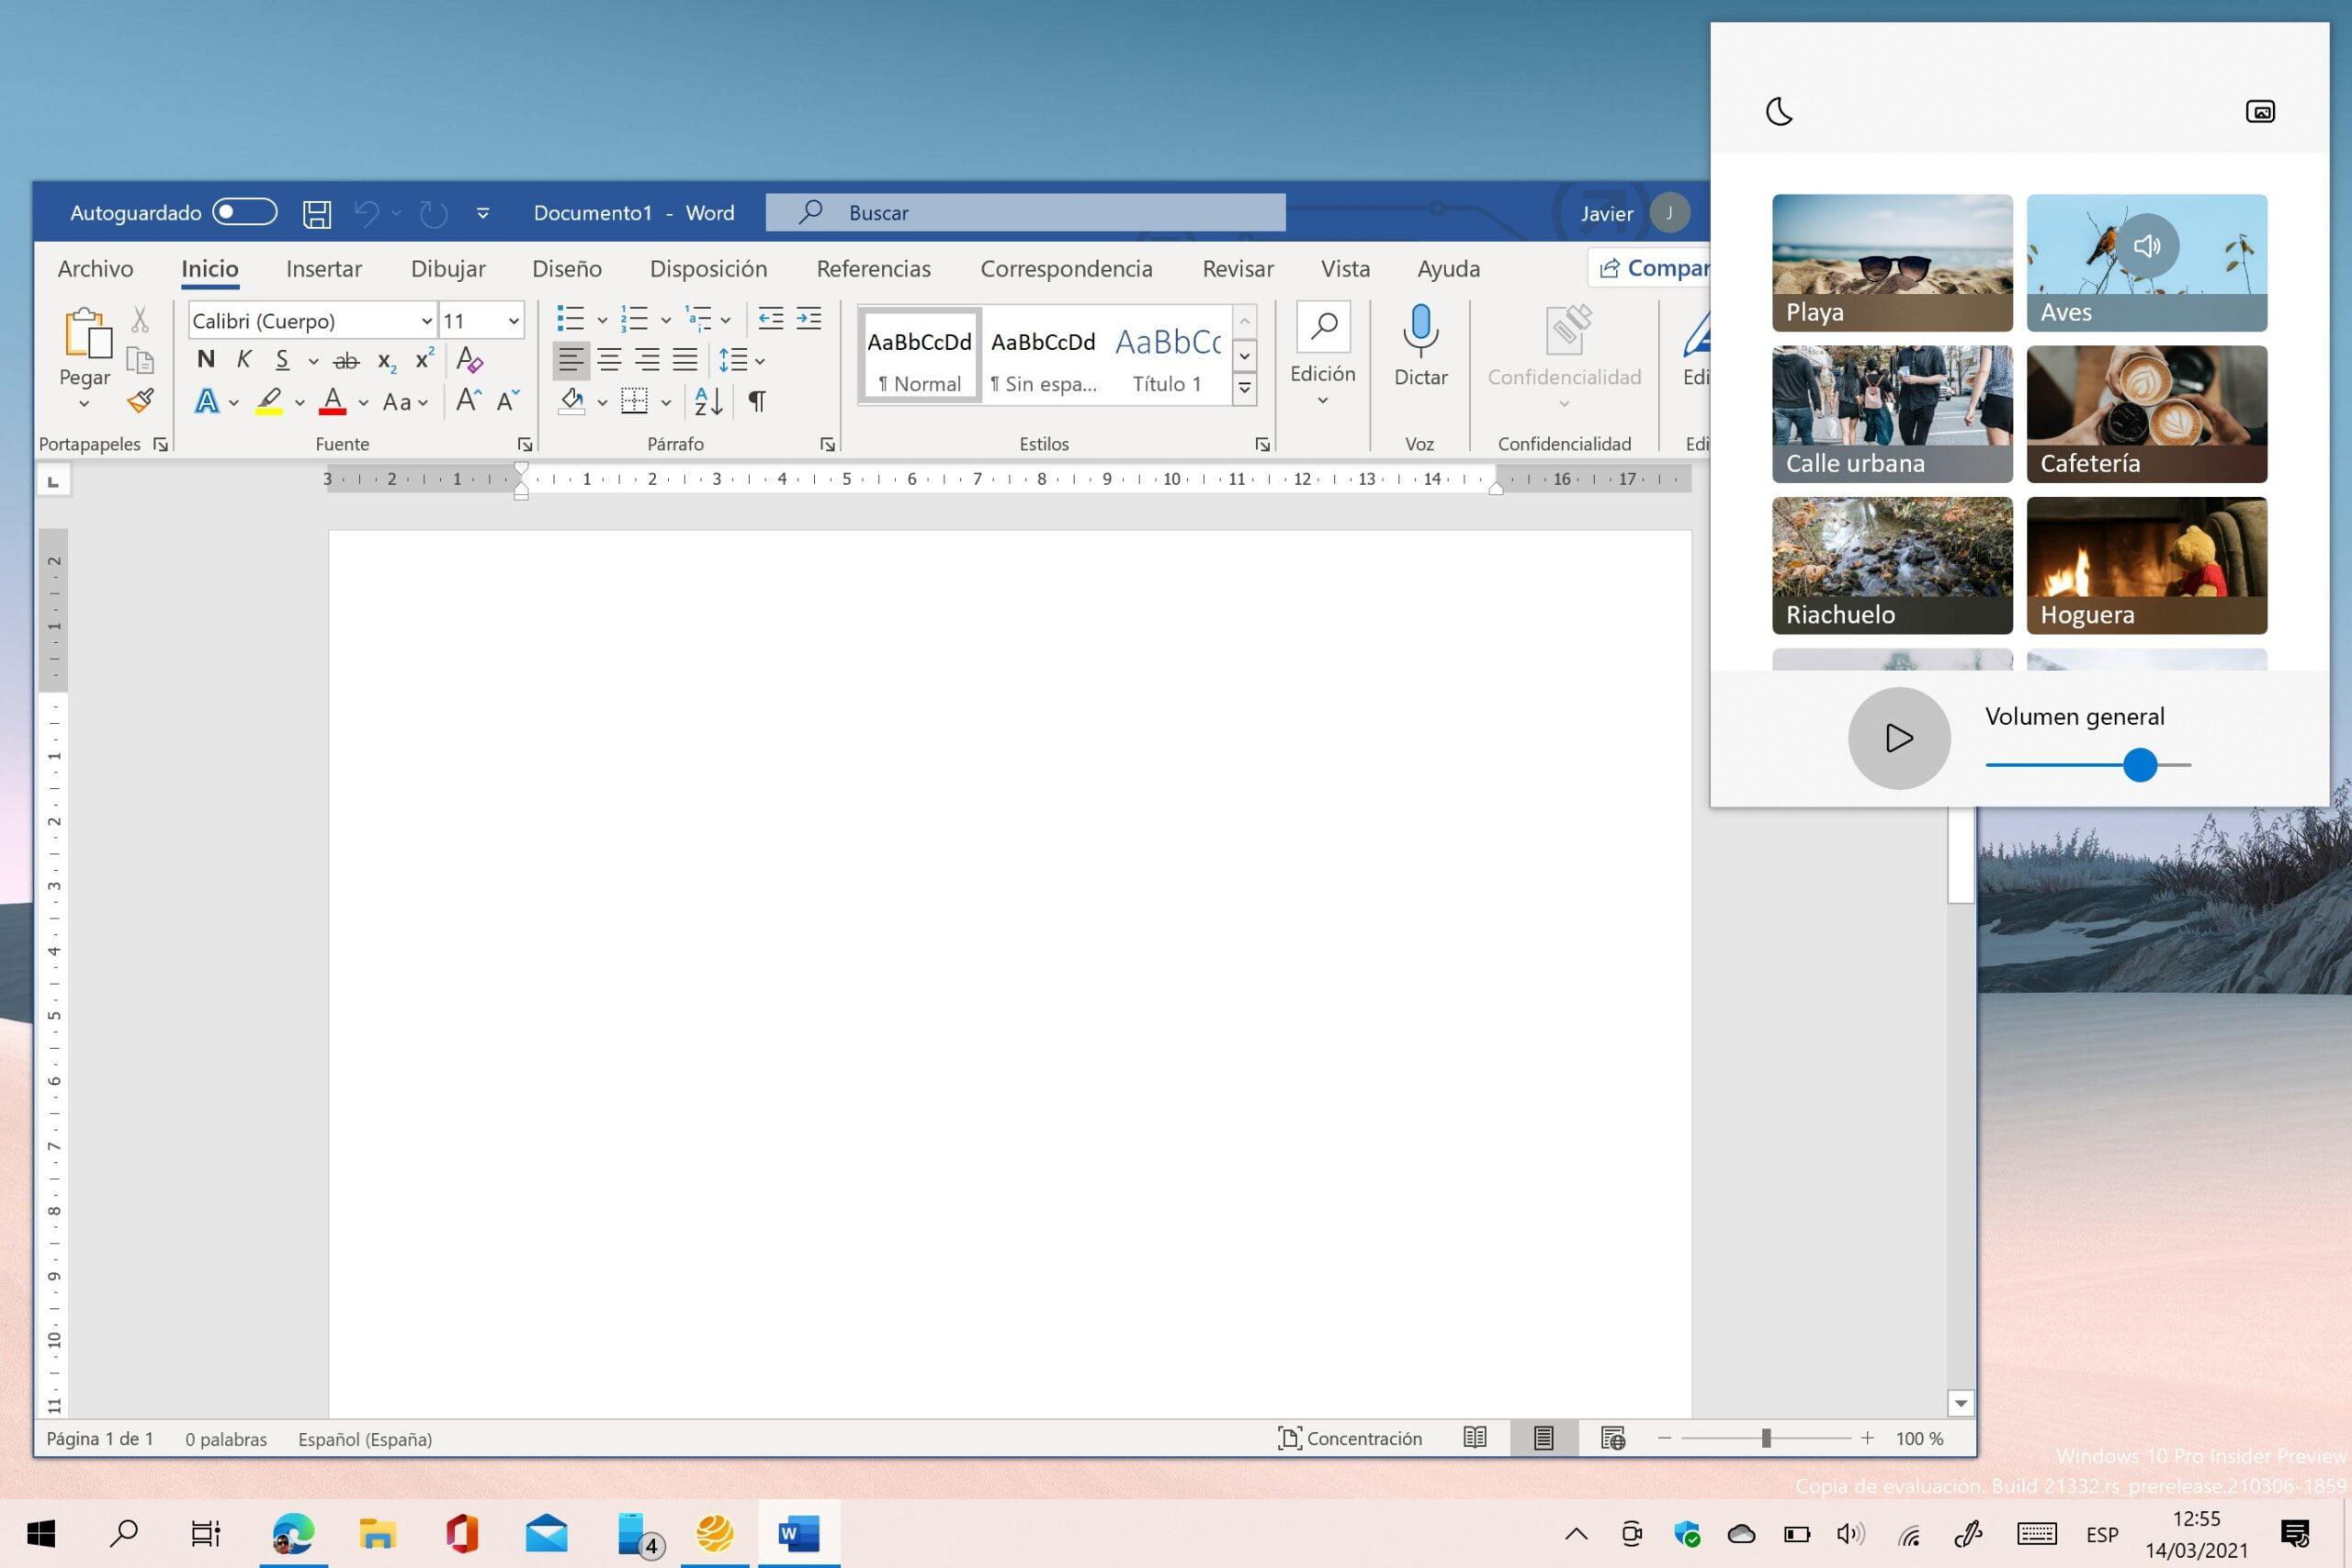 Minirreproductor de Ambie White Noise usando Microsoft Word